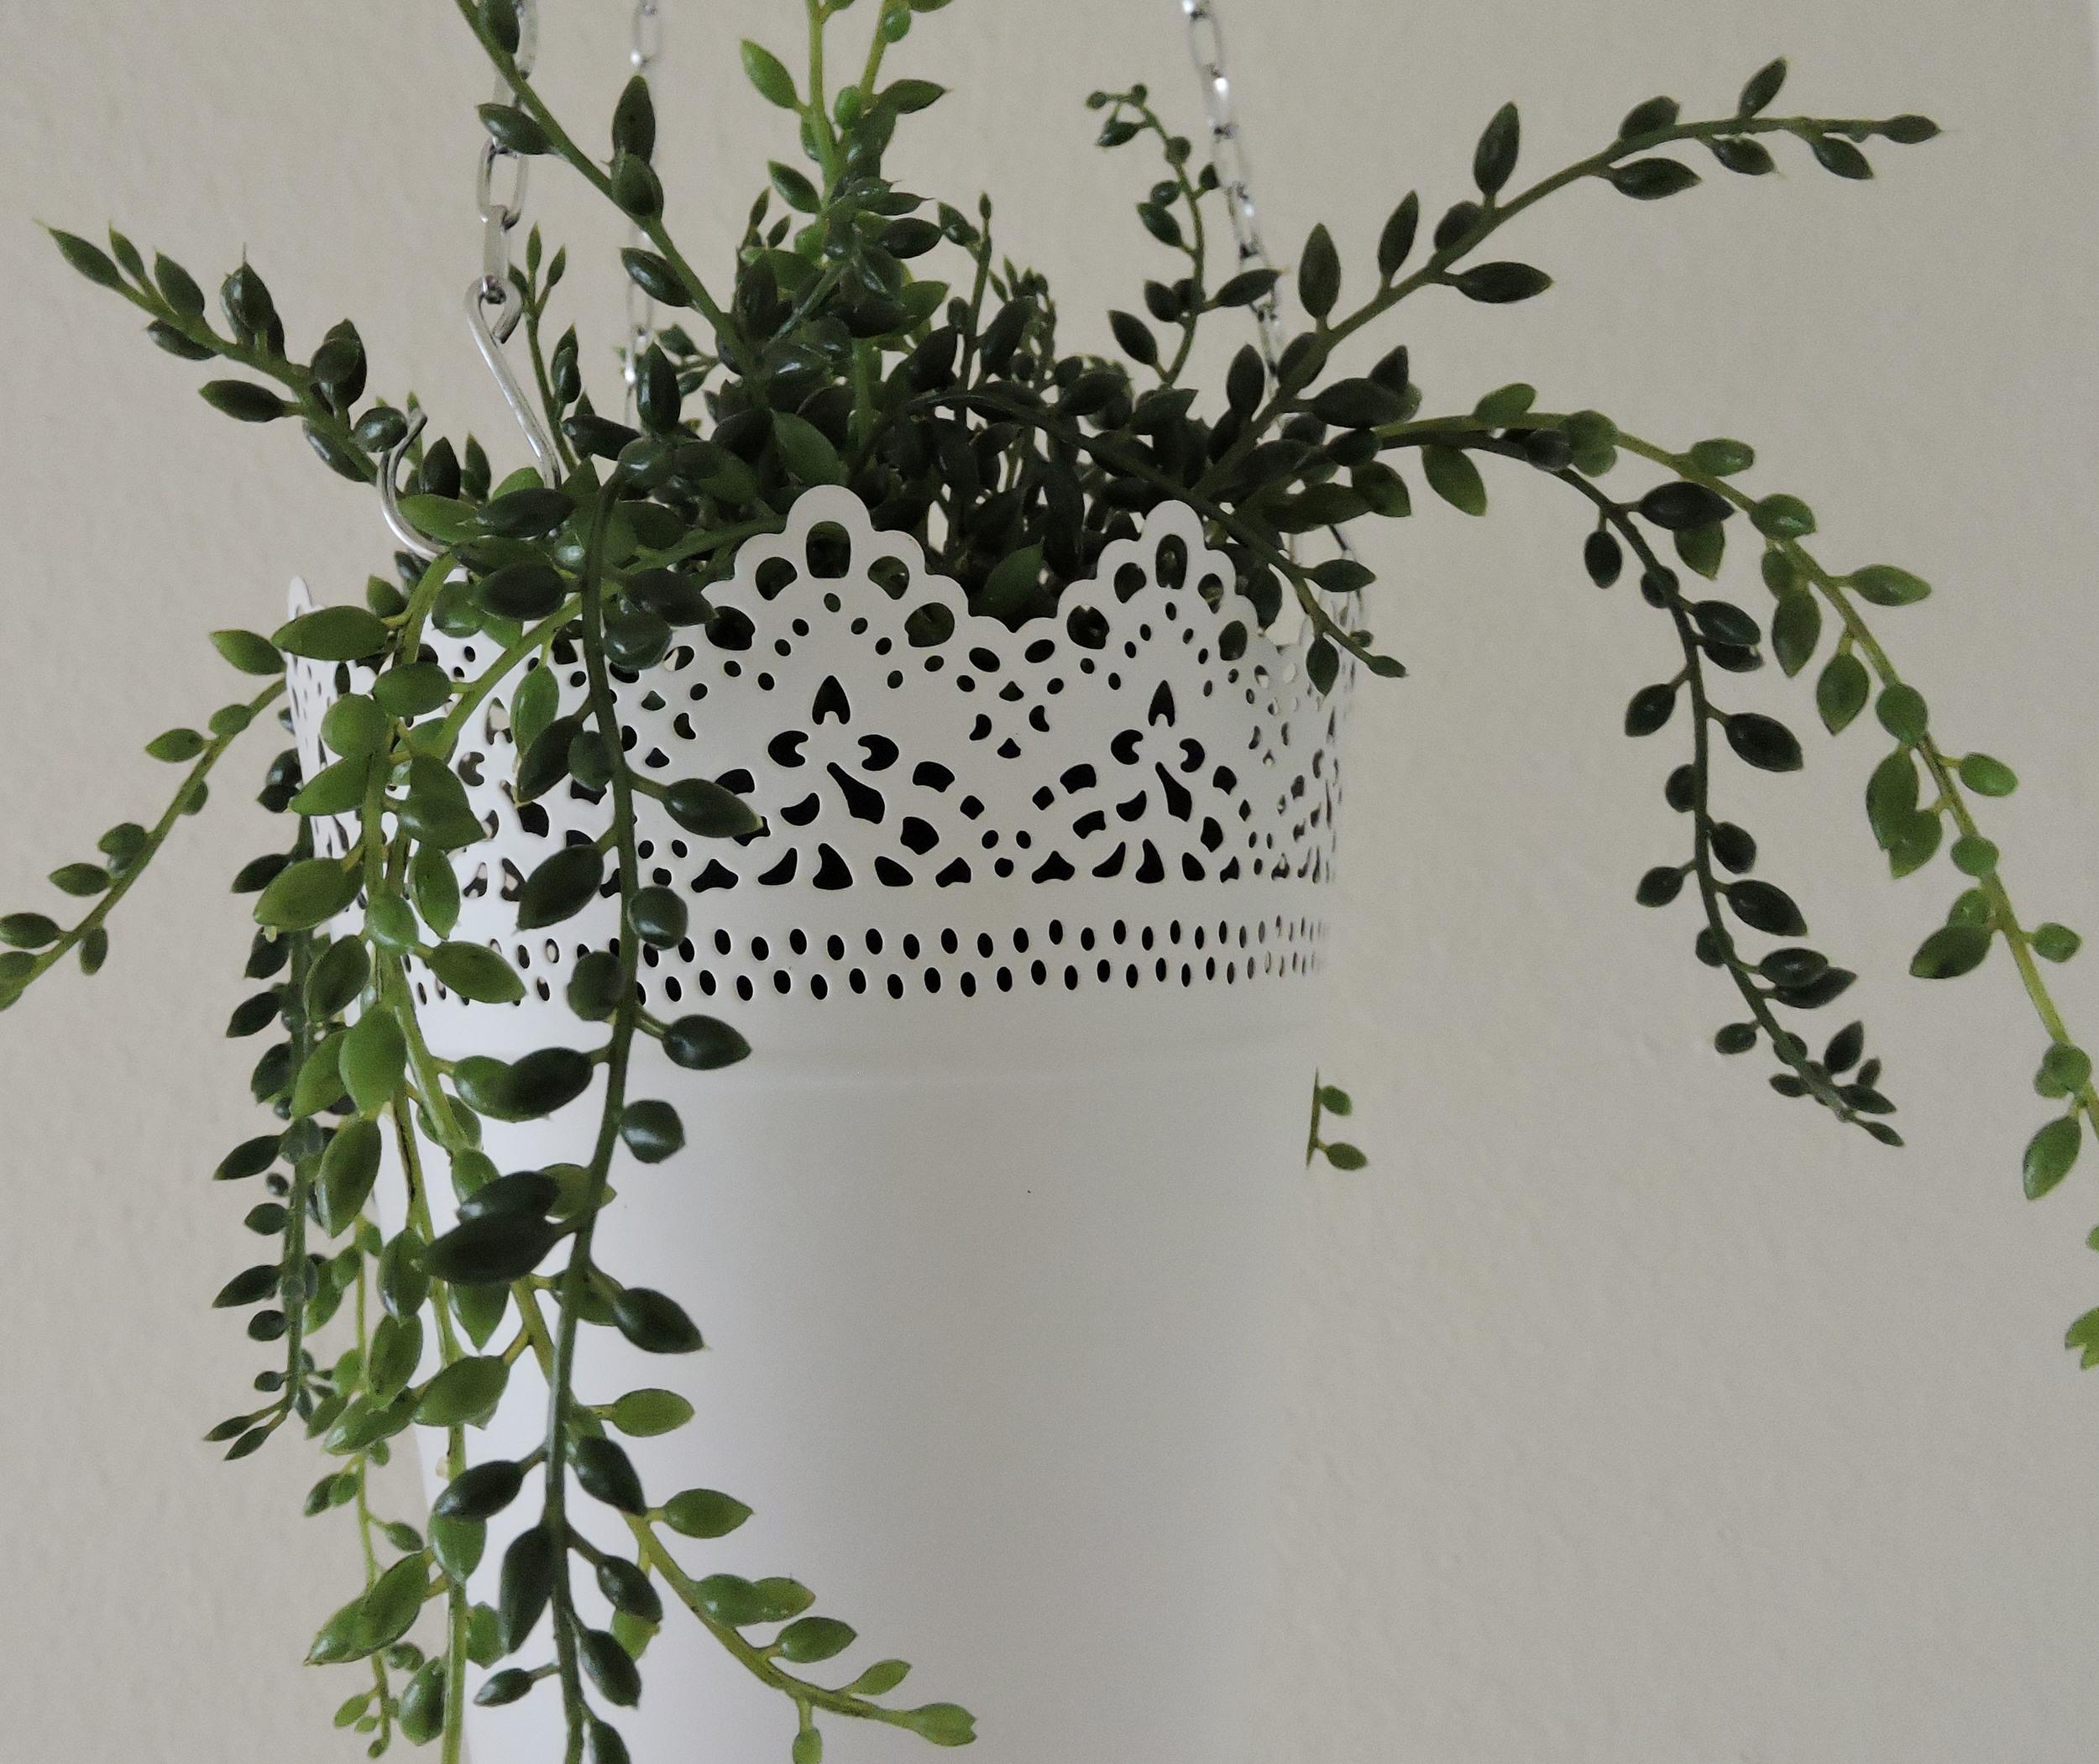 hanging plant3.jpg